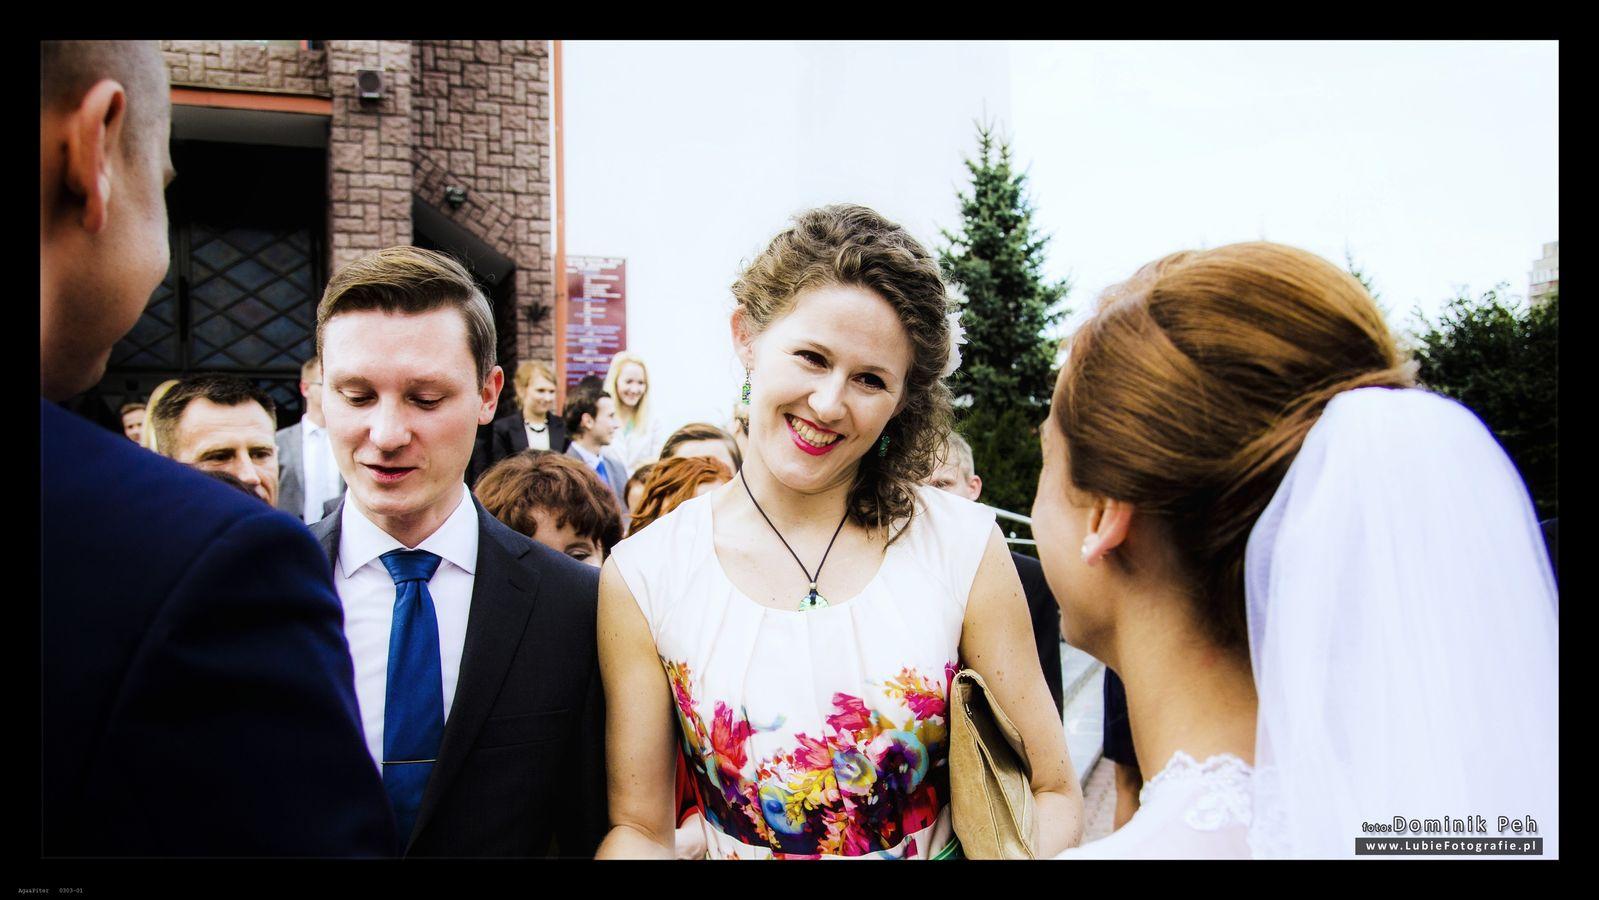 Agnieszka&Piotr  0015